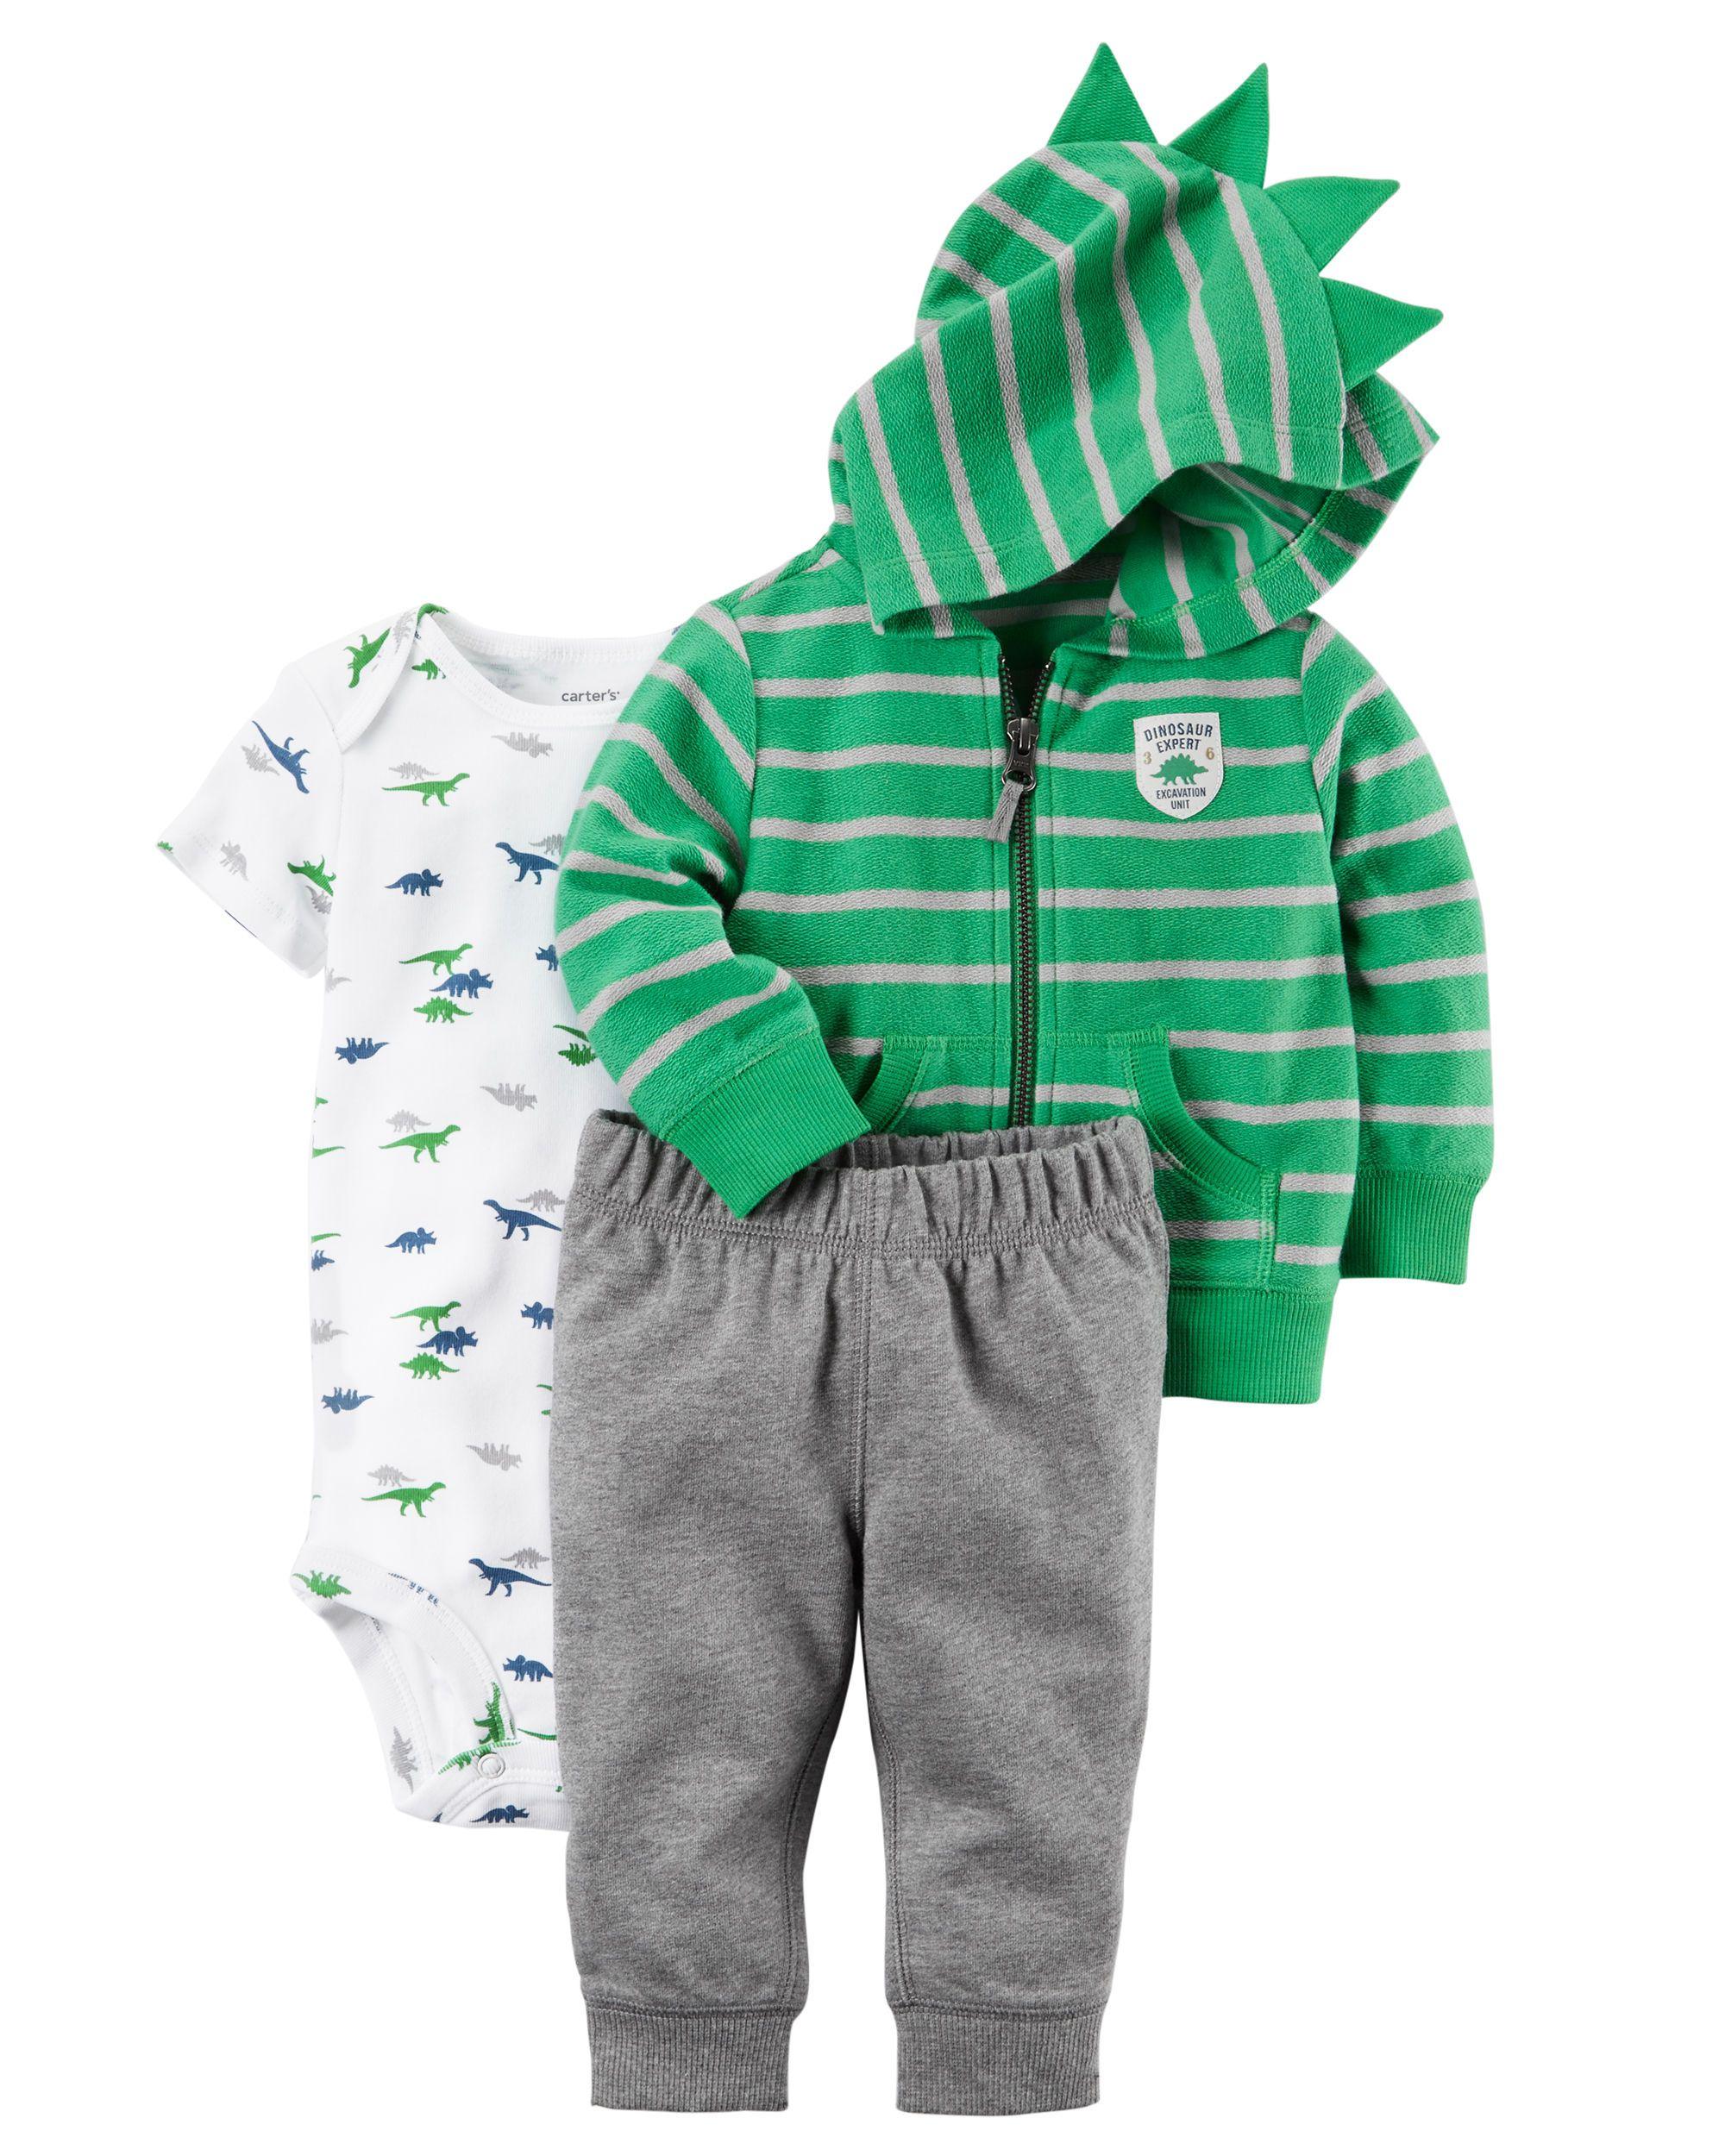 8f3893642 3-Piece Little Jacket Set   Bitty baby 2017   Carters baby boys ...